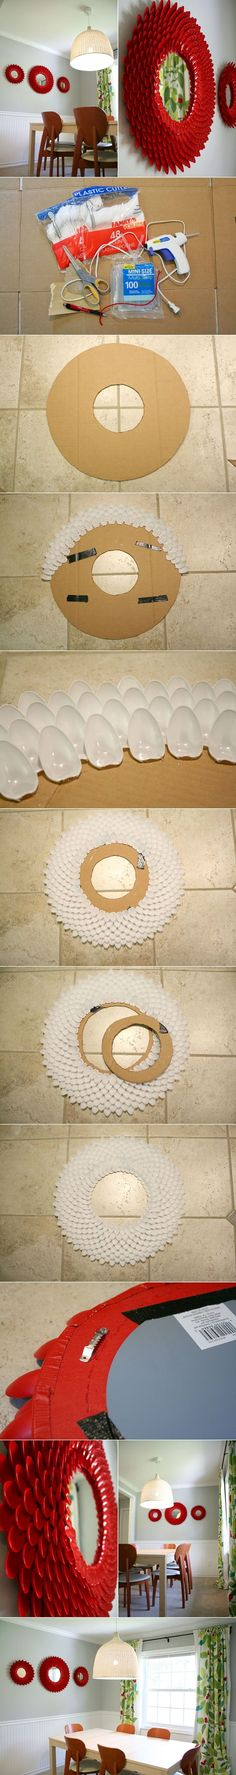 DIY Decorative Chrysanthemum Mirror with Plastic Spoons   www.FabArtDIY.com LIKE Us on Facebook ==> https://www.facebook.com/FabArtDIY: